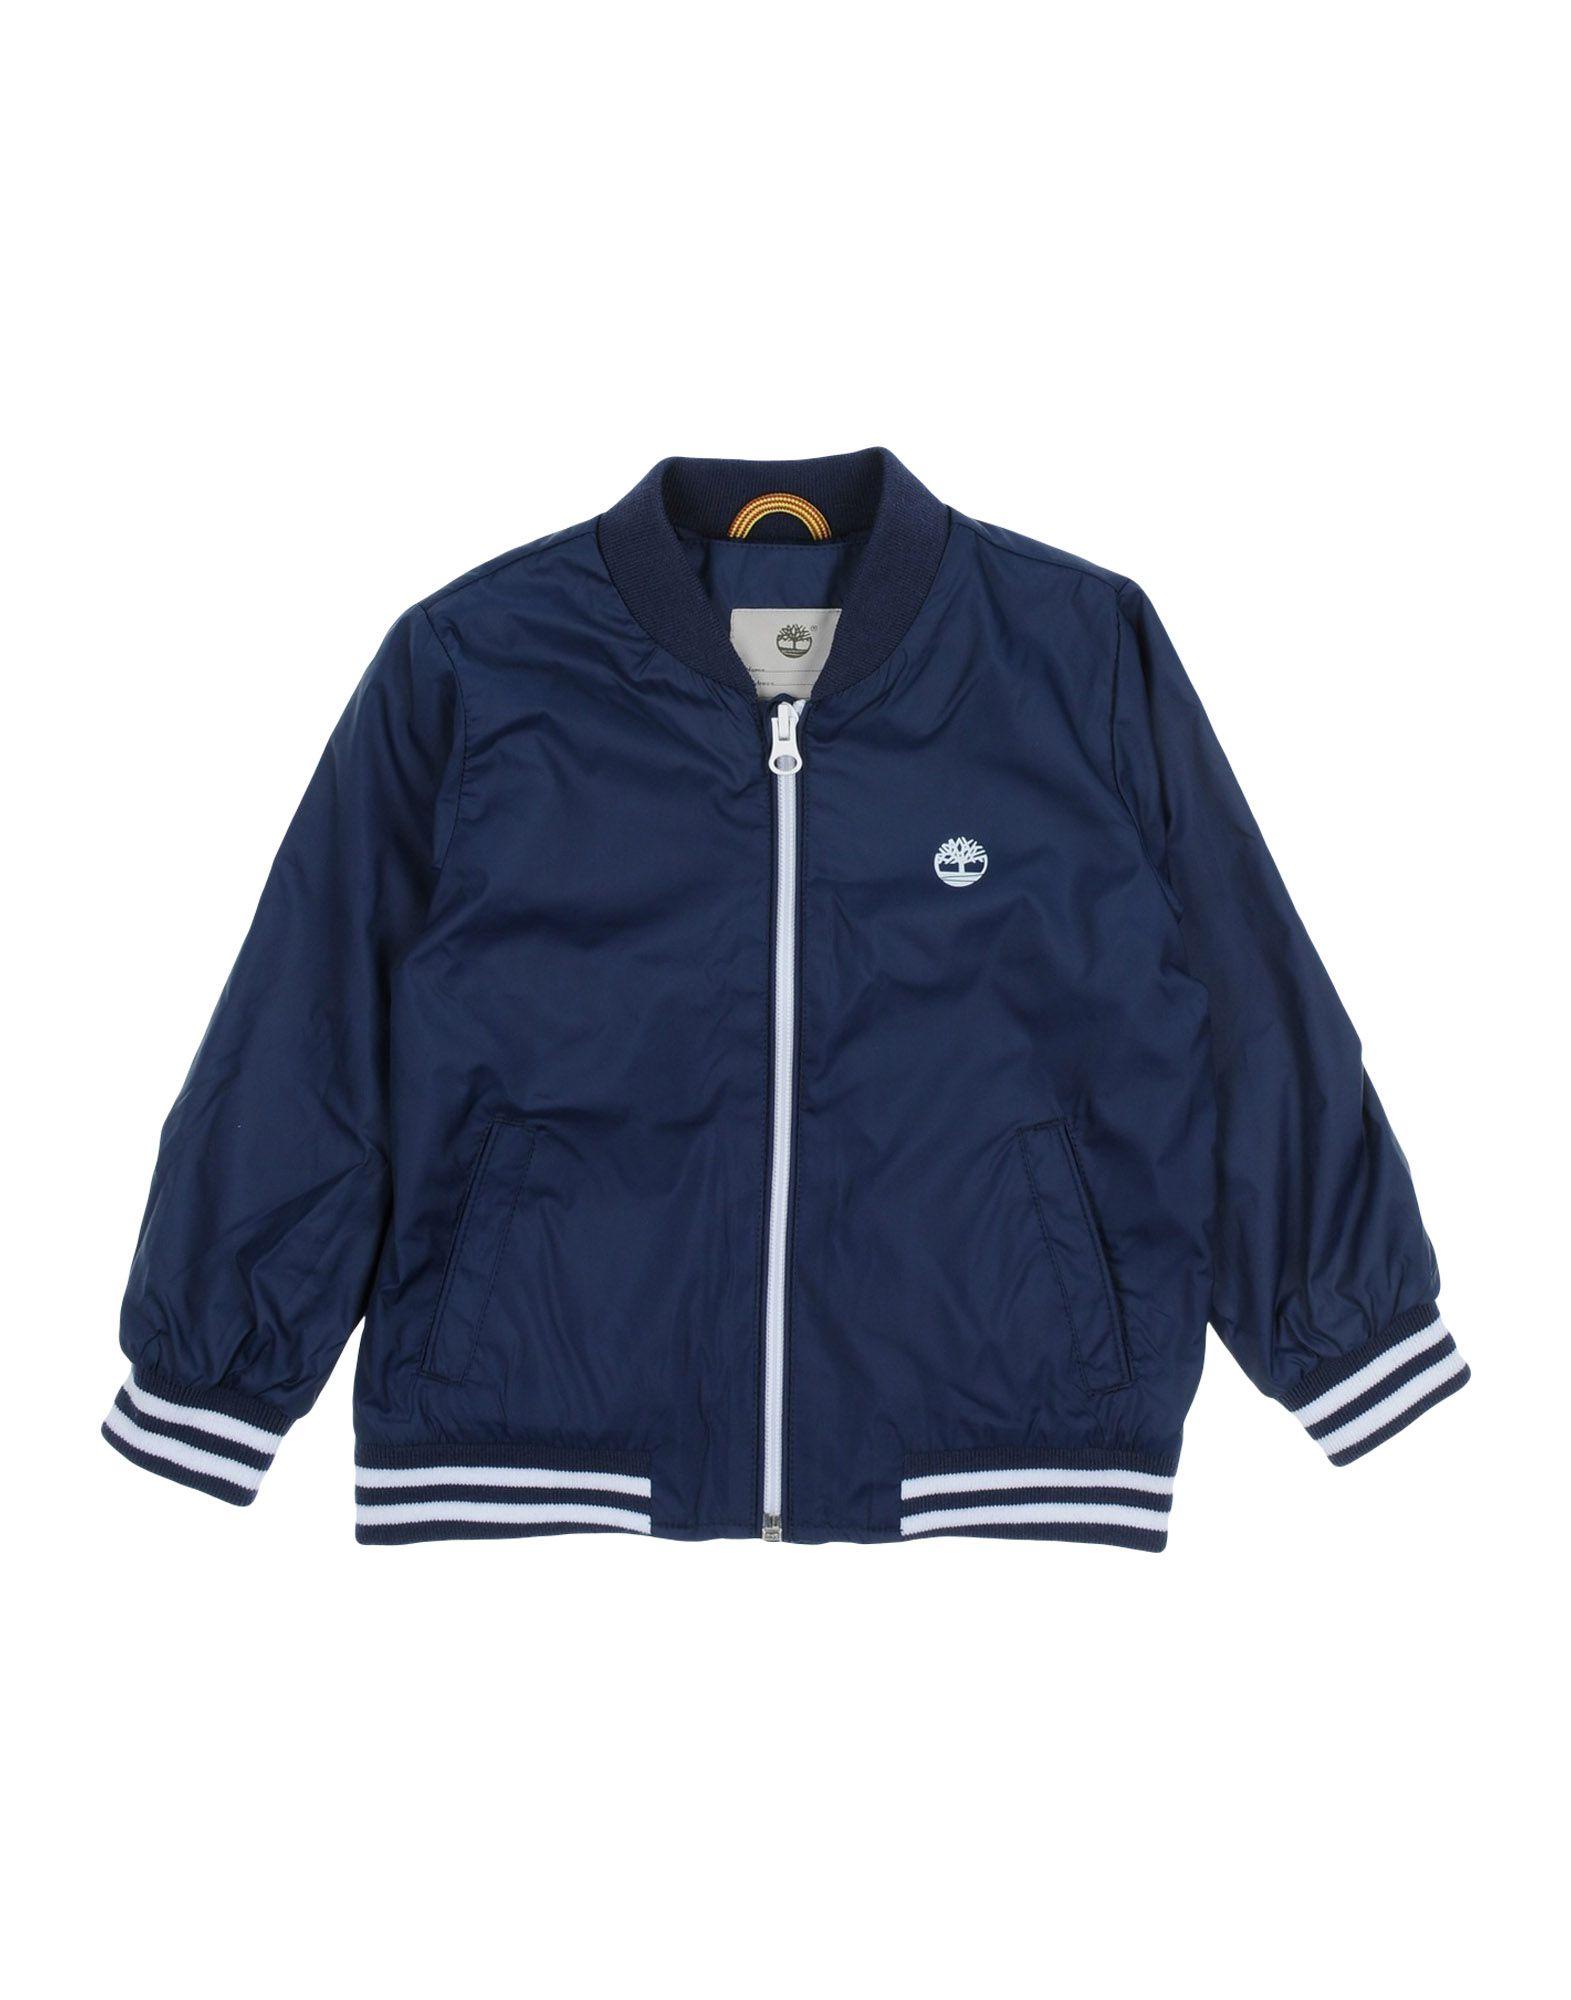 Timberland - Coats & Jackets - Jackets - On Yoox.com